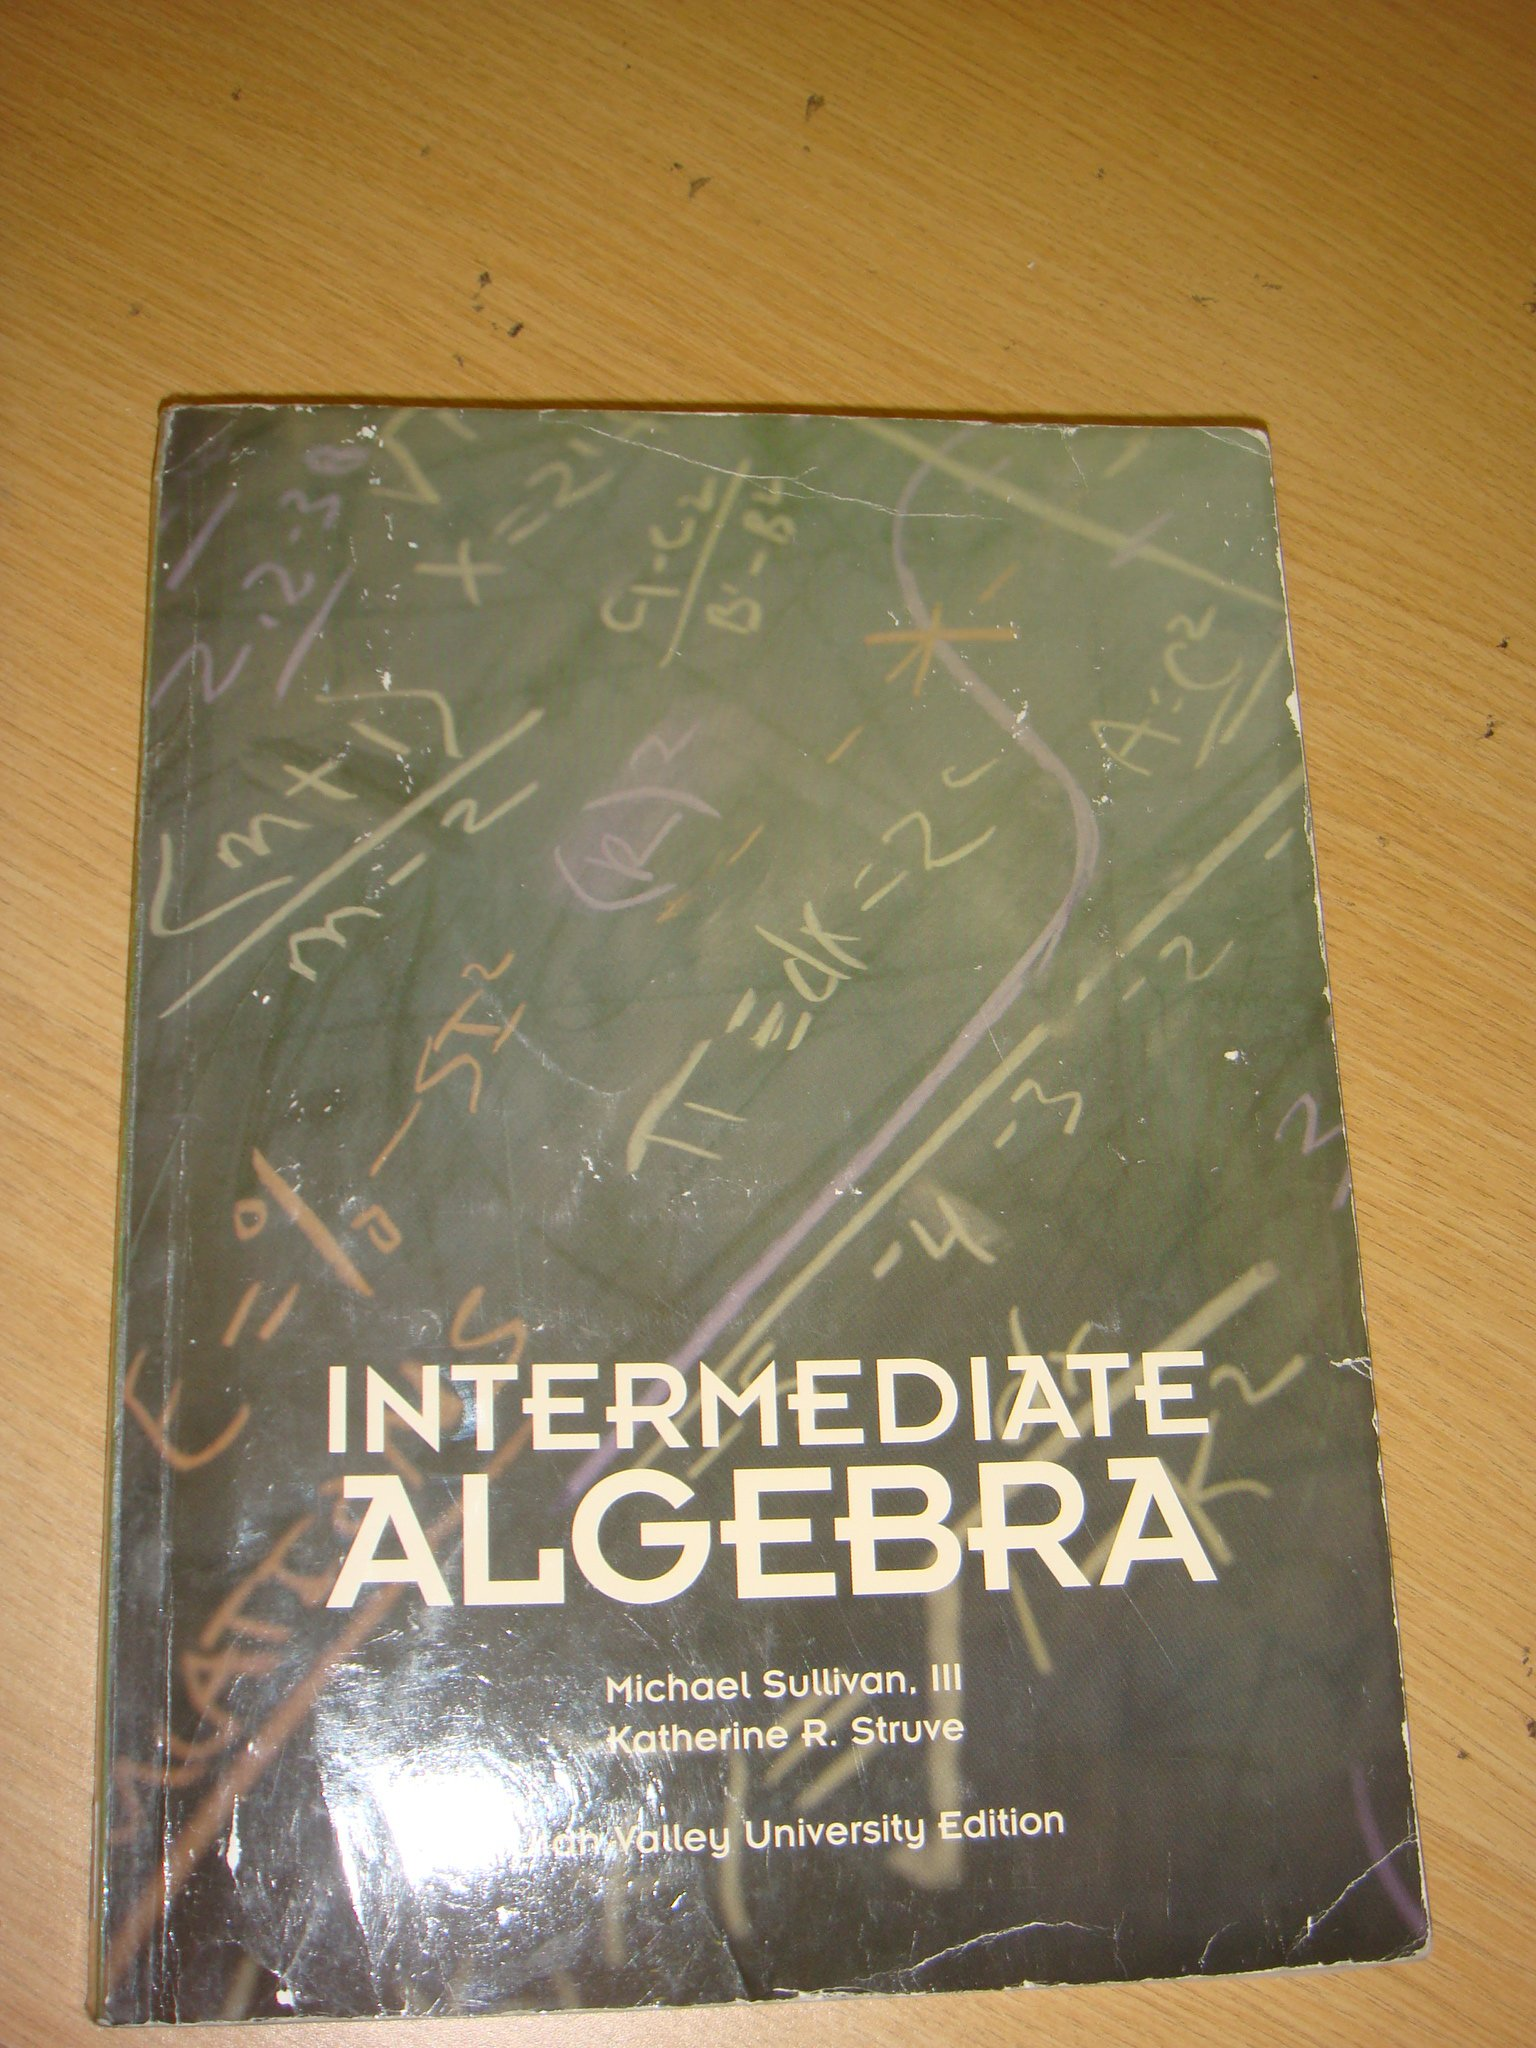 Intermediate Algebra Utah Valley University Edition (Based on 2nd edition) PDF